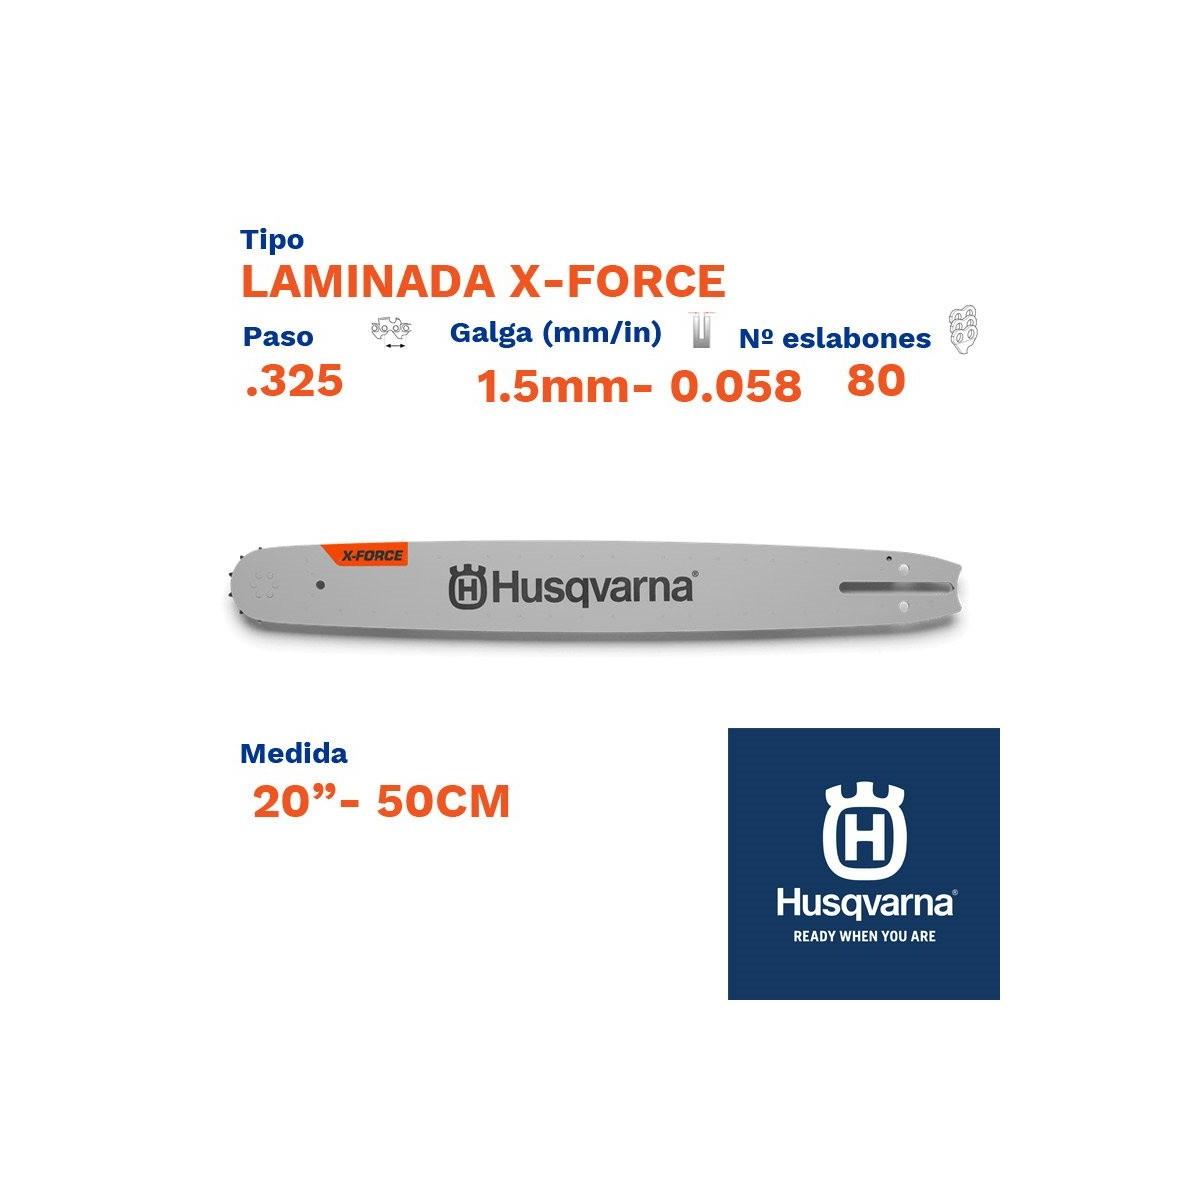 "Husqvarna espada laminada x-force 1.5mm 80 eslabones-pc .325  20""- 50cm"